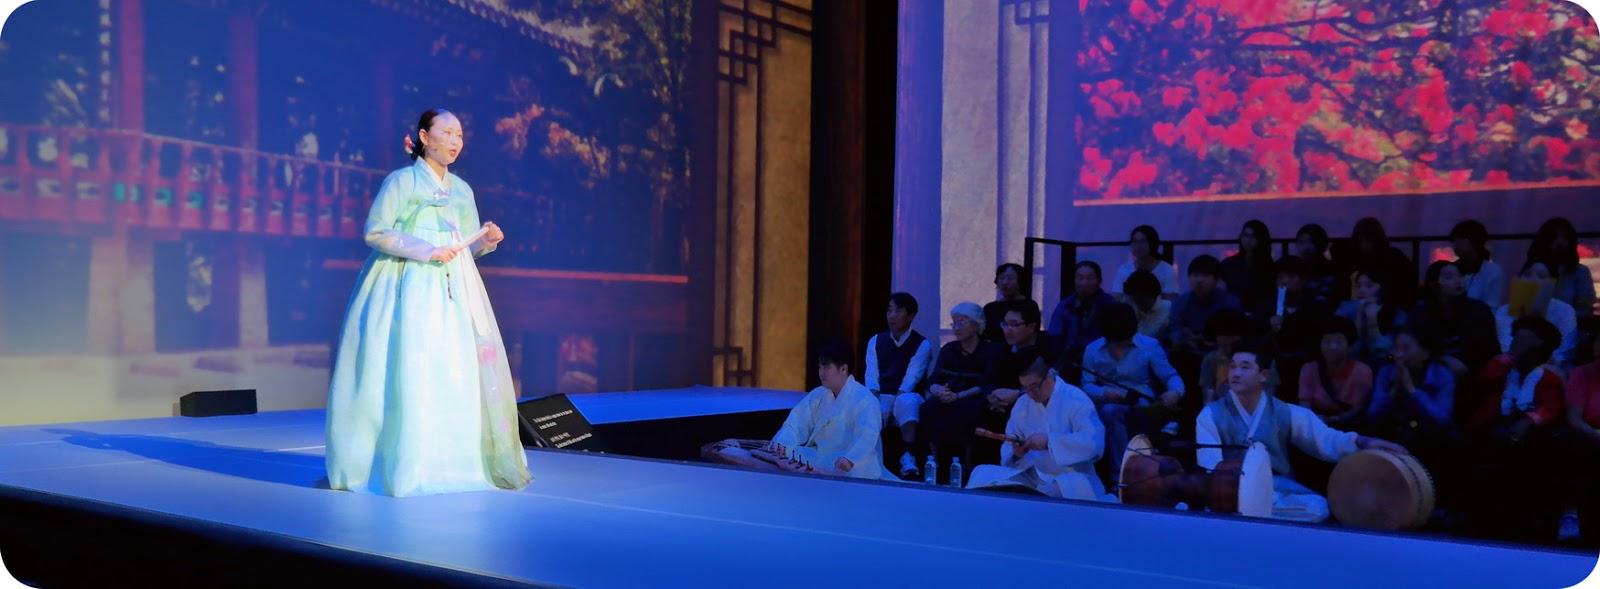 Kto Archives Blog Indonesia Tcash Vaganza 17 Kk New Motif 2016 Pansori Jeonju Korea